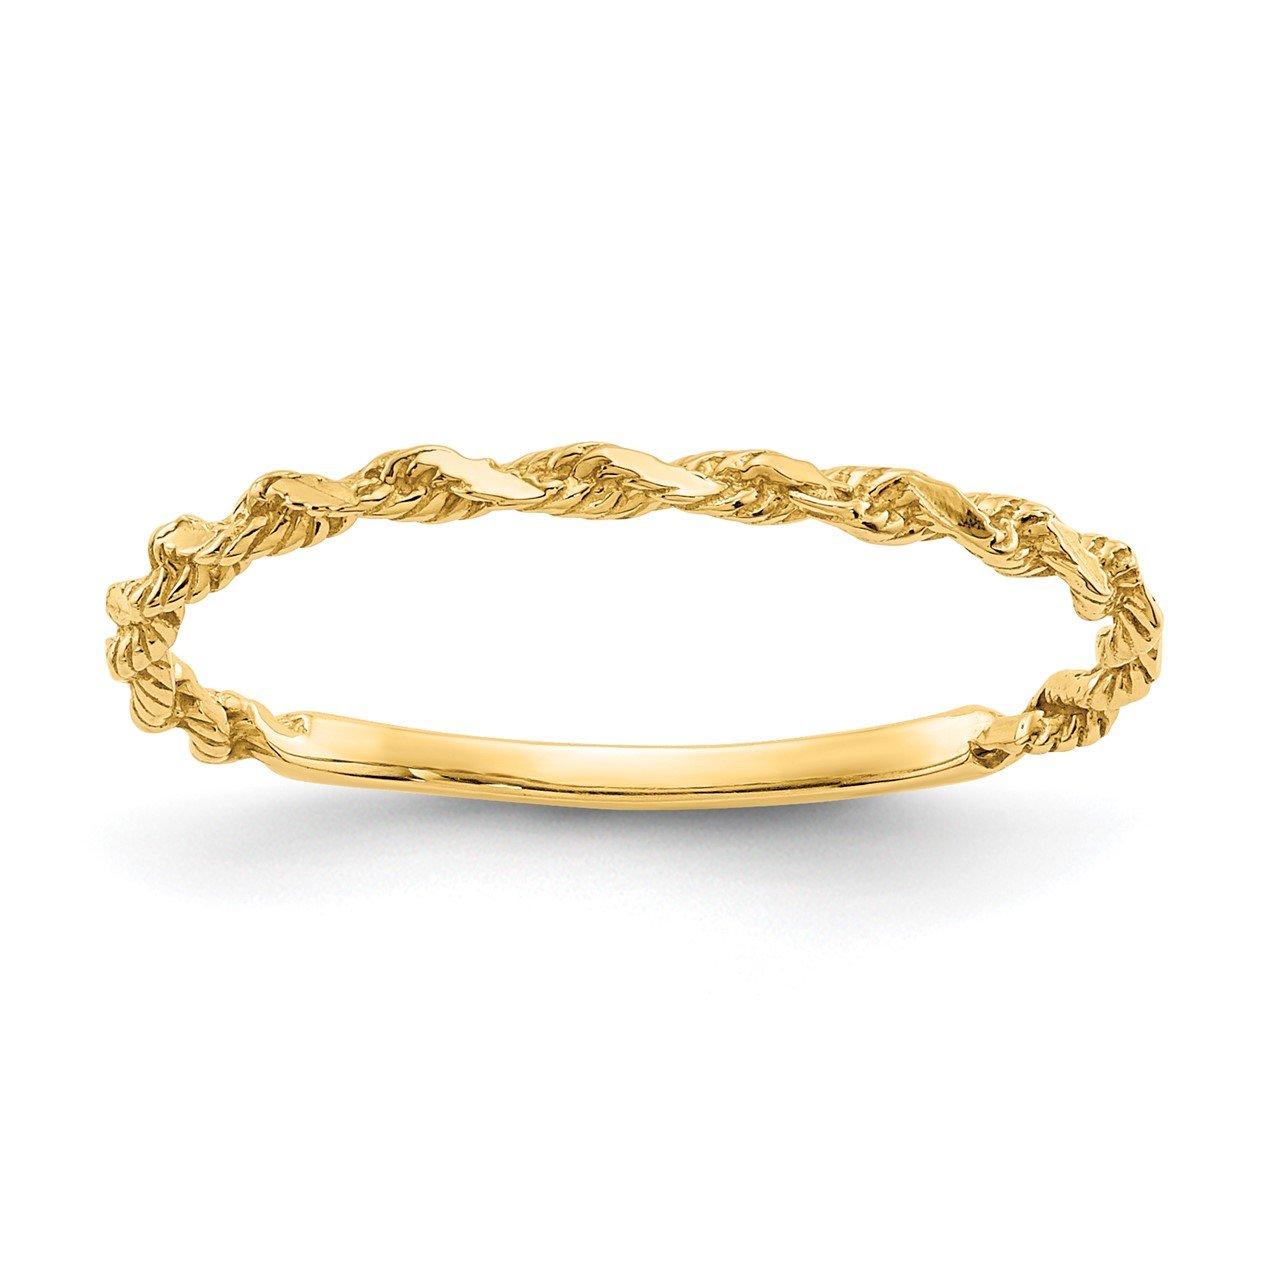 14K Diamond-cut Textured Rope Band Ring